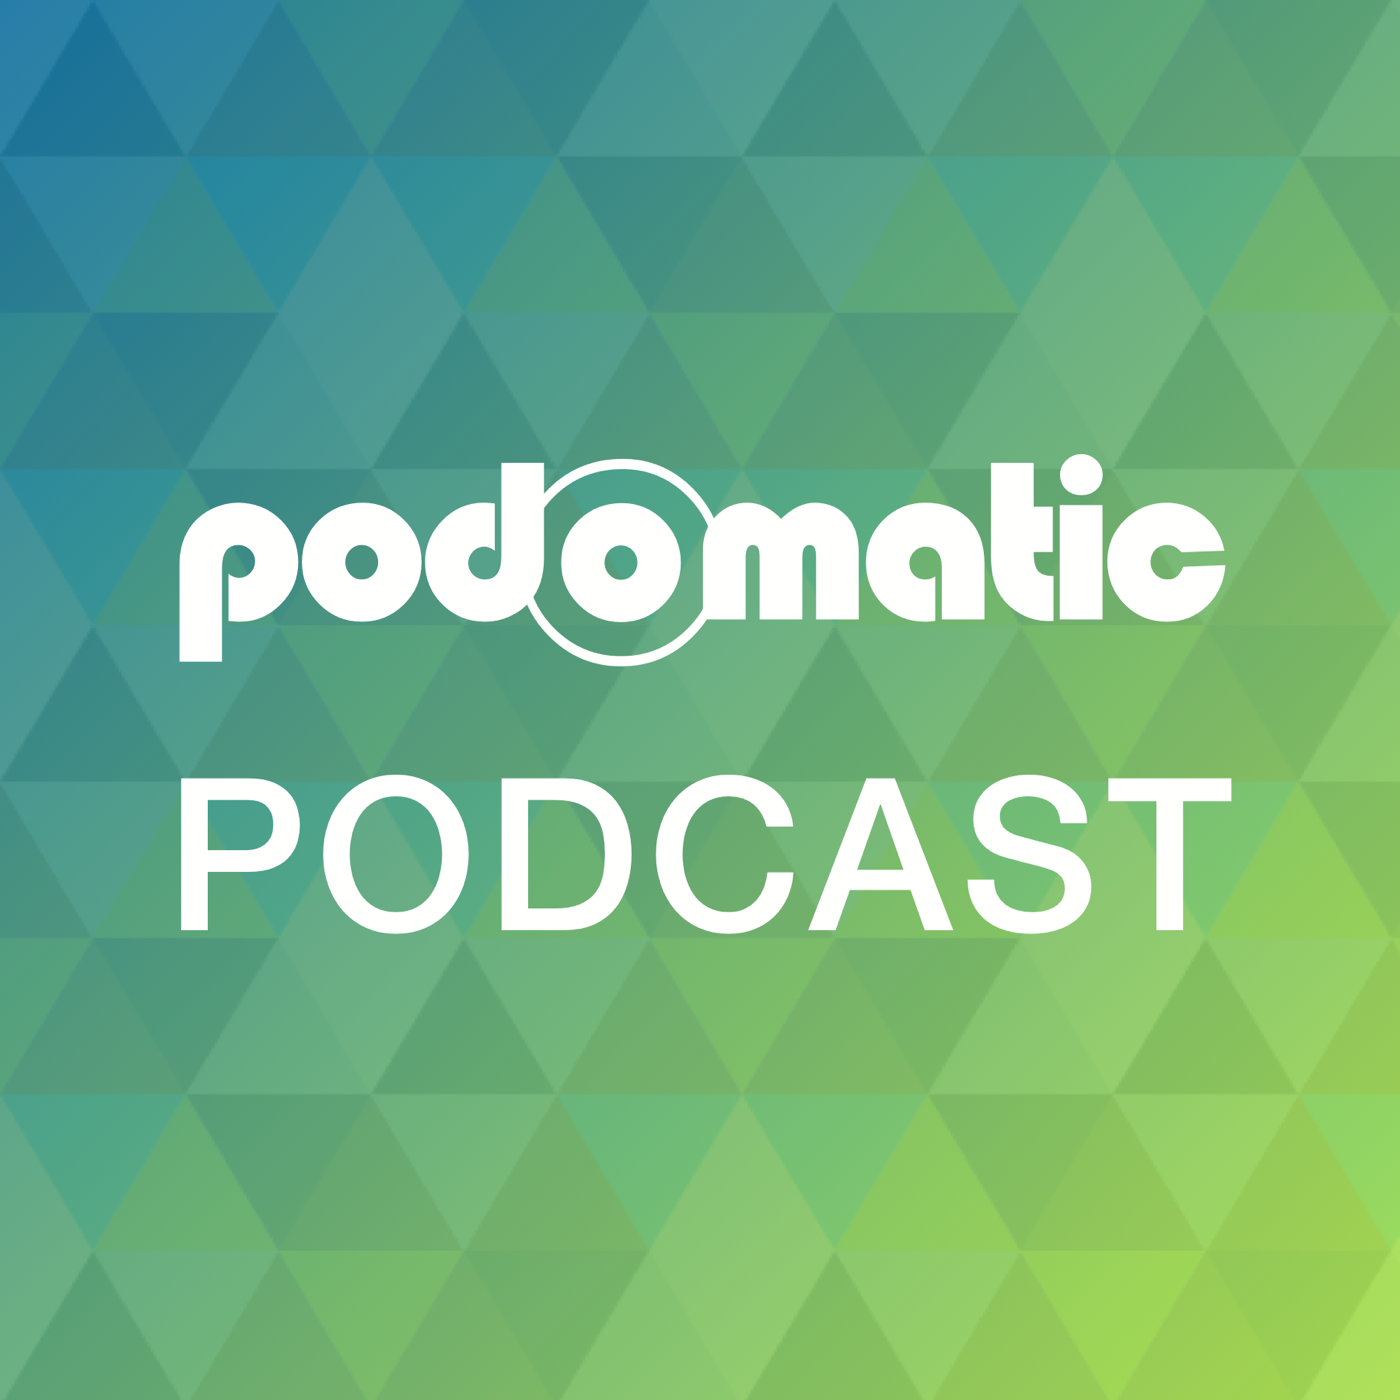 motivacaobb's Podcast